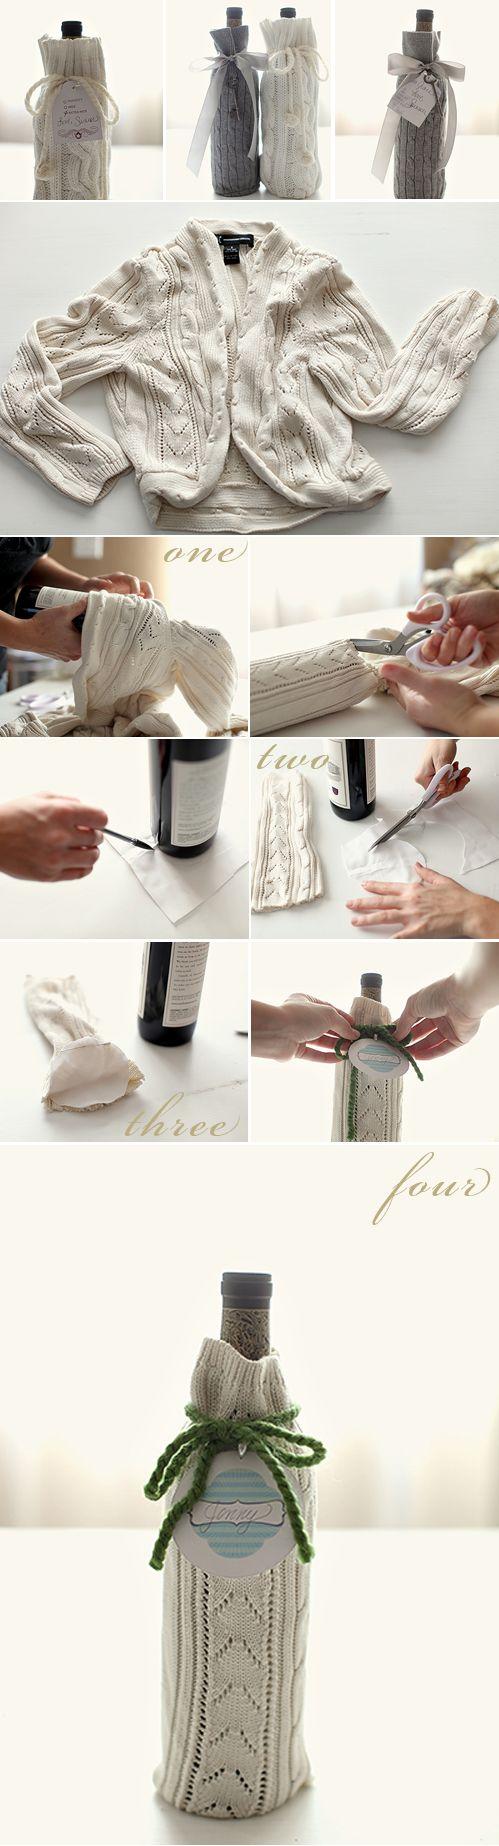 #DIY wine bottle gift wrap